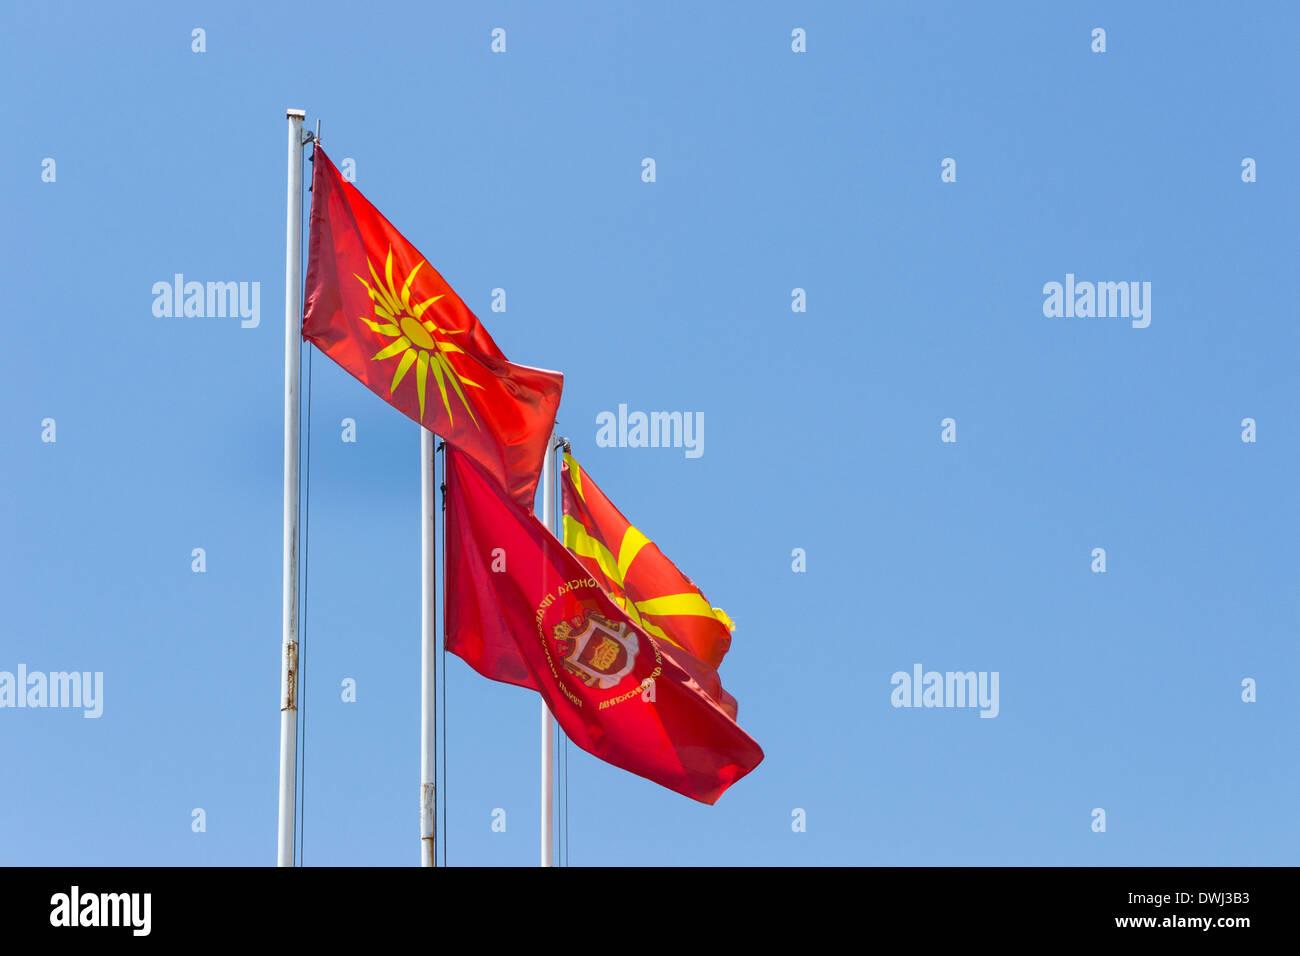 Macedonian flags: old Vergina Flag, Macedonian Orthodox Church flag, new Macedonian flag - Stock Image